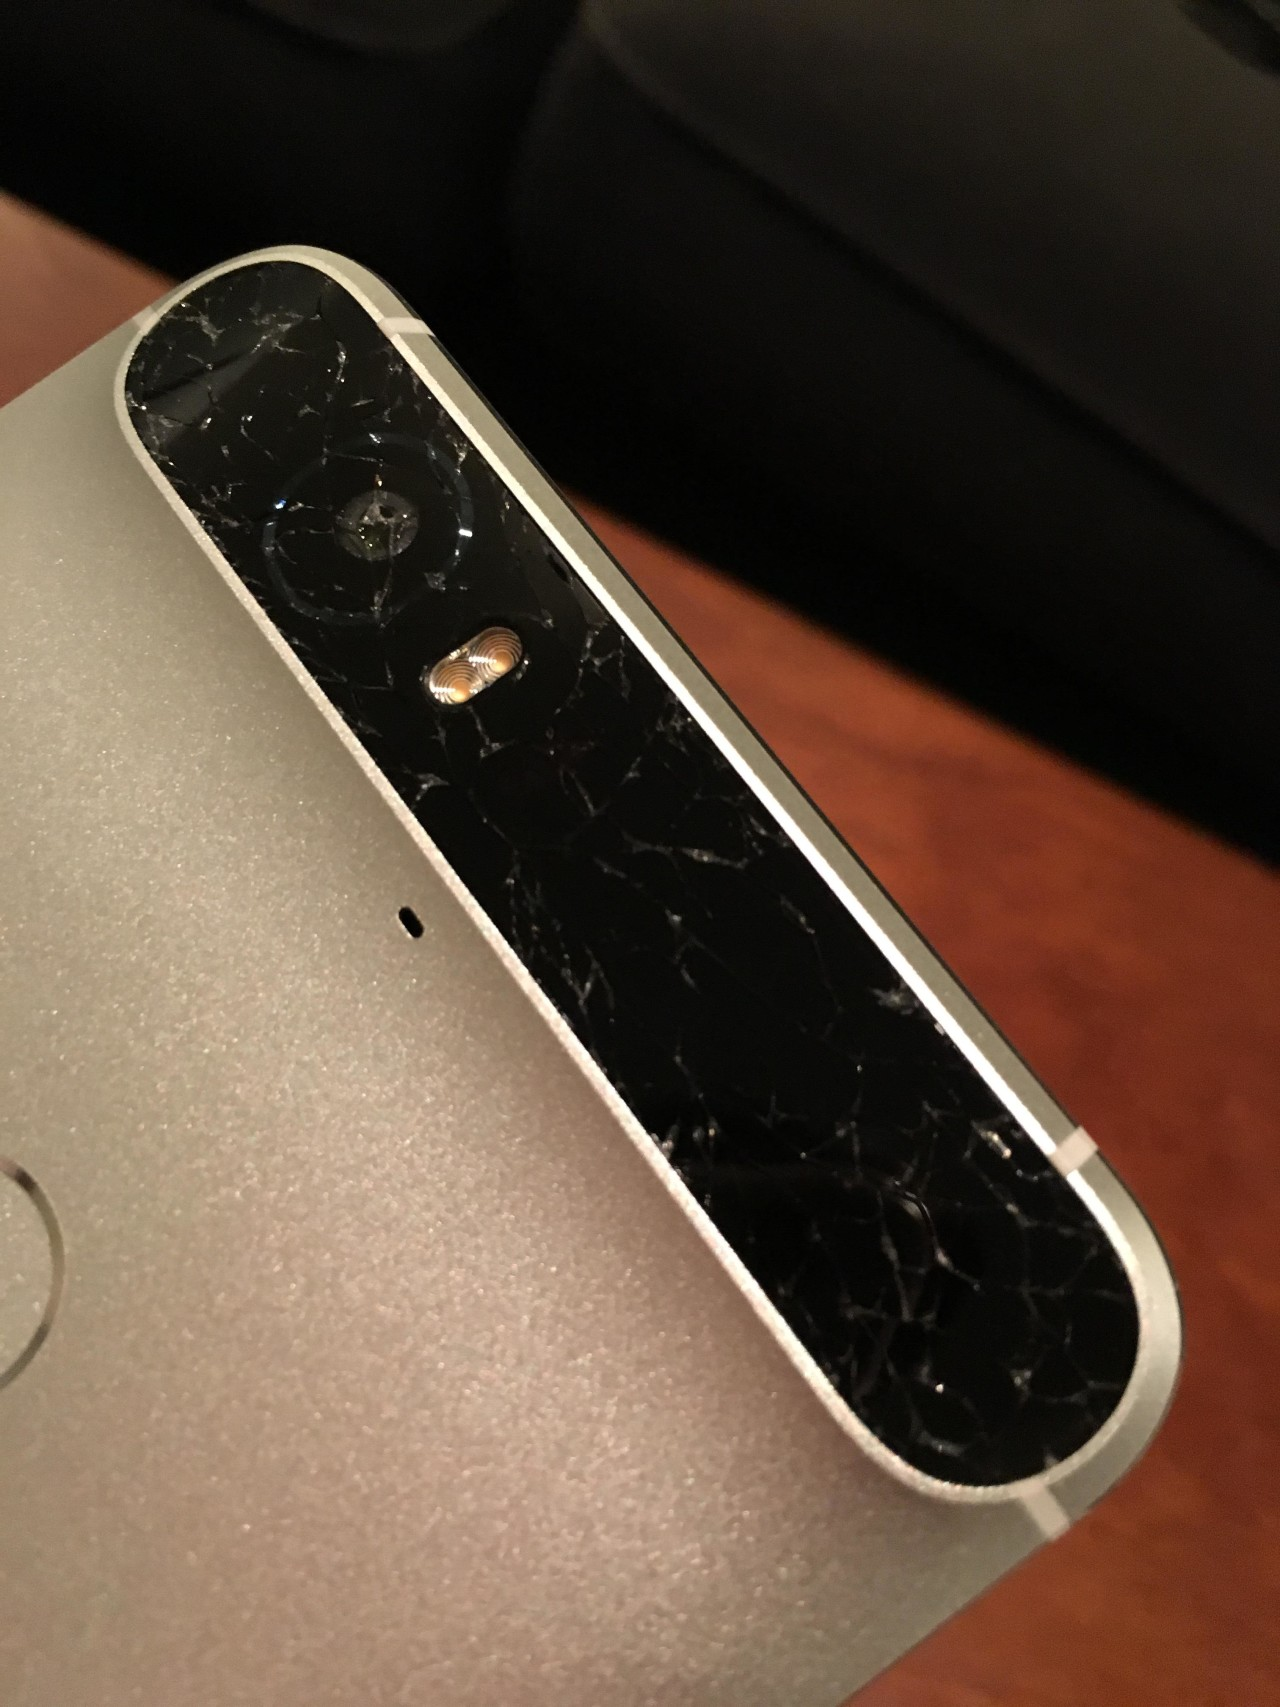 Nexus 6P Roto